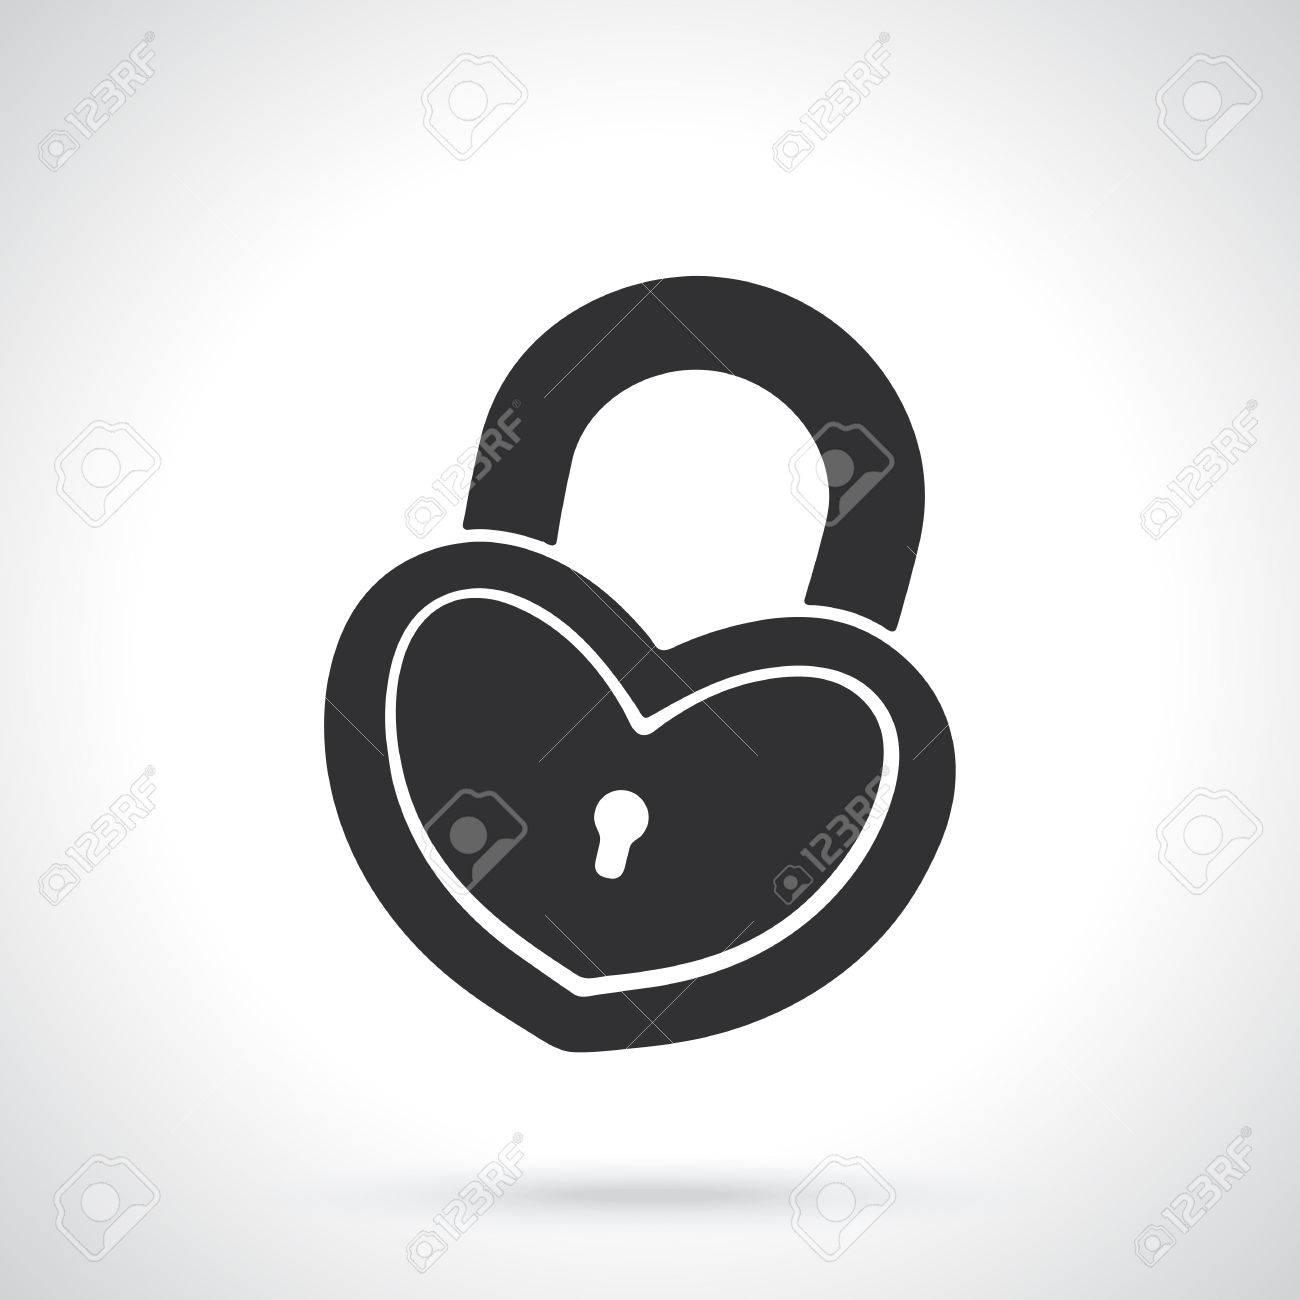 Vector Illustration Silhouette Of Padlock In Heart Shape Template